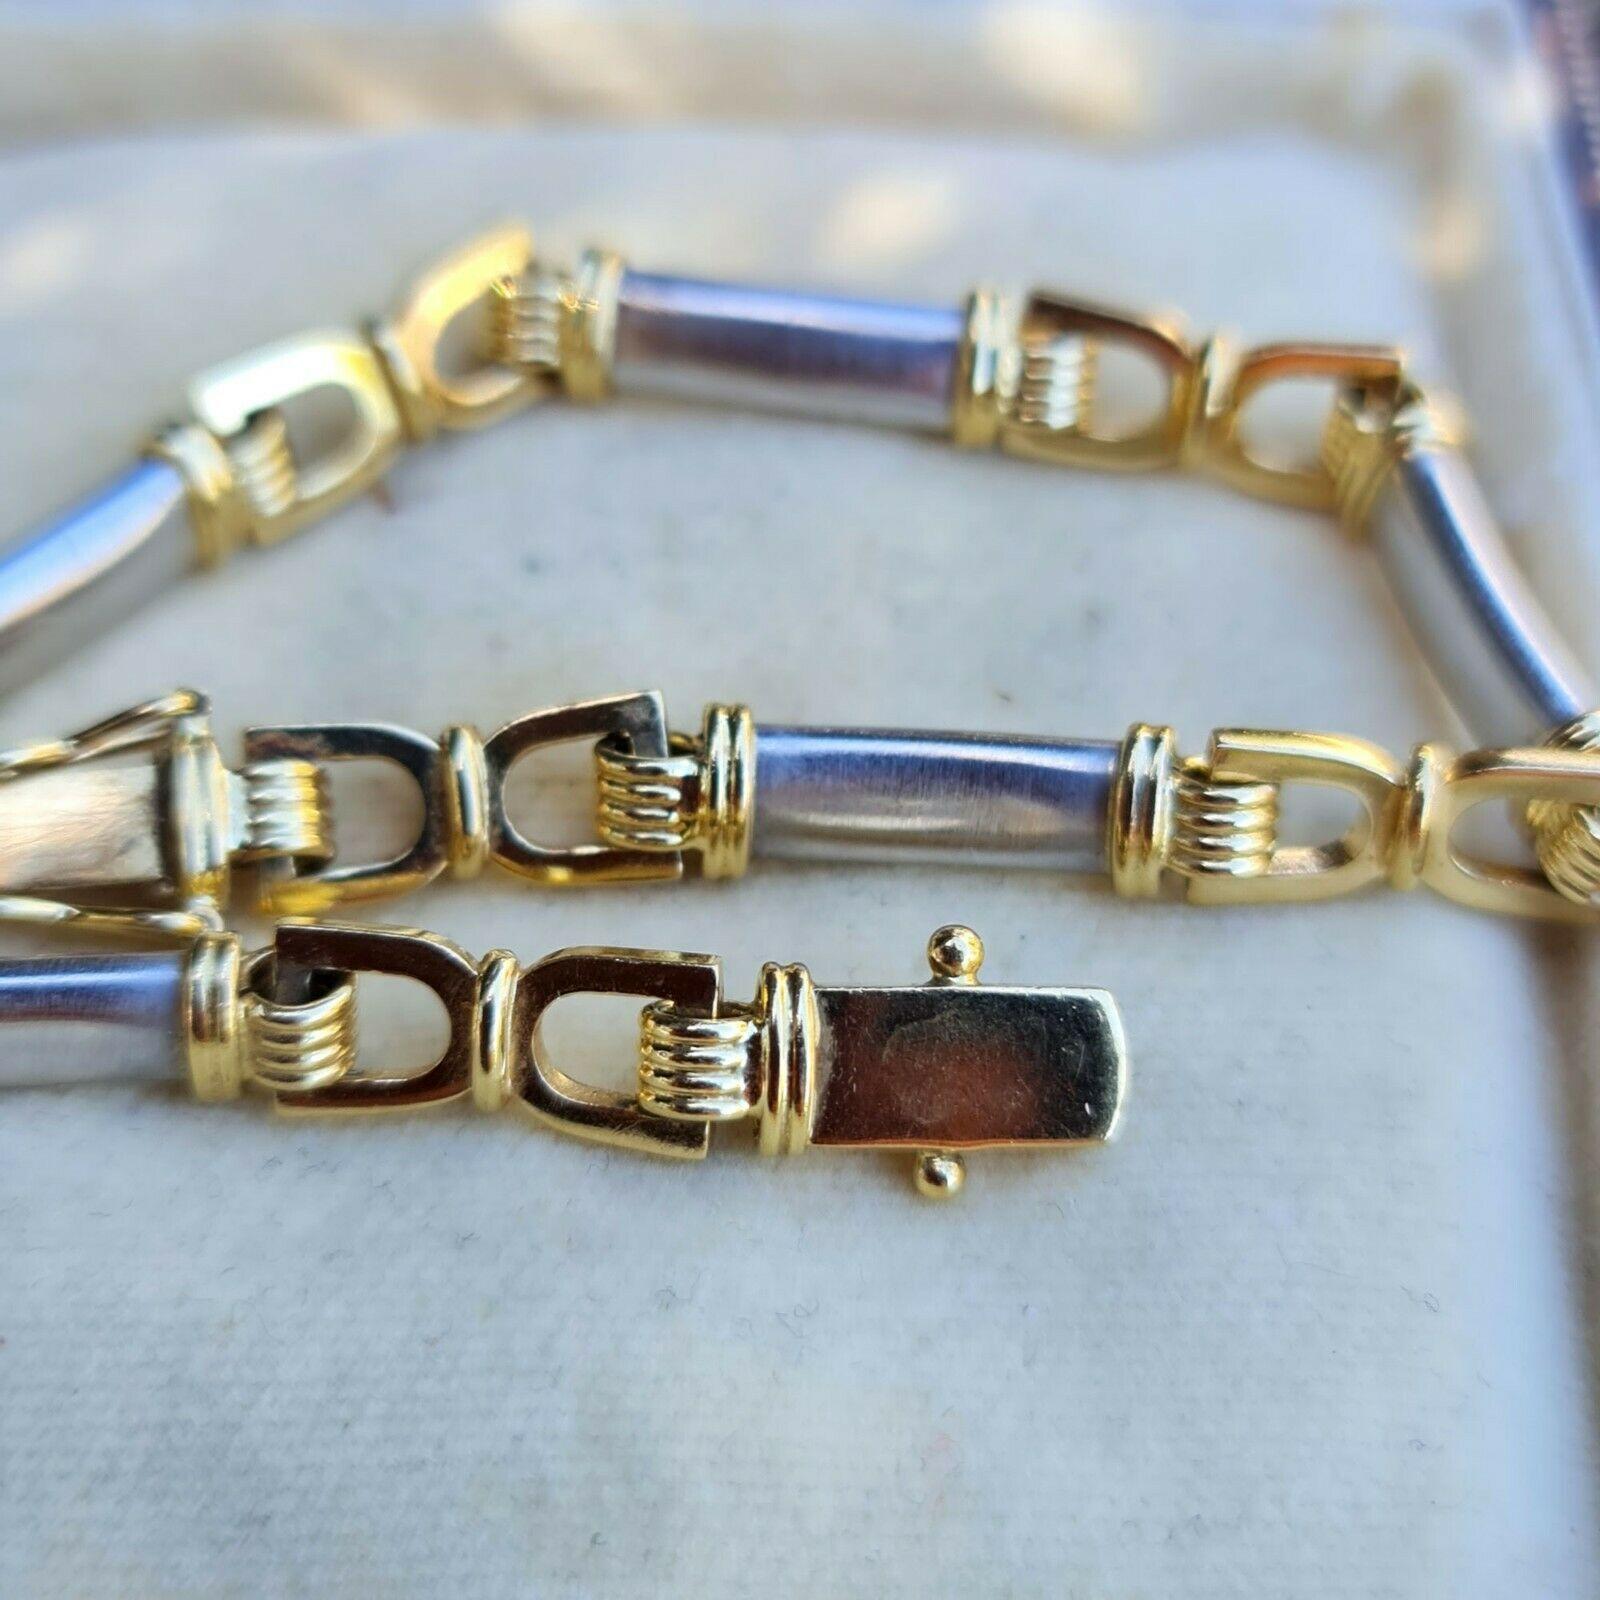 Fabulous, 18ct, 18k, 750 two-colour Gold, equestrian themed bracelet, 20.1 grams